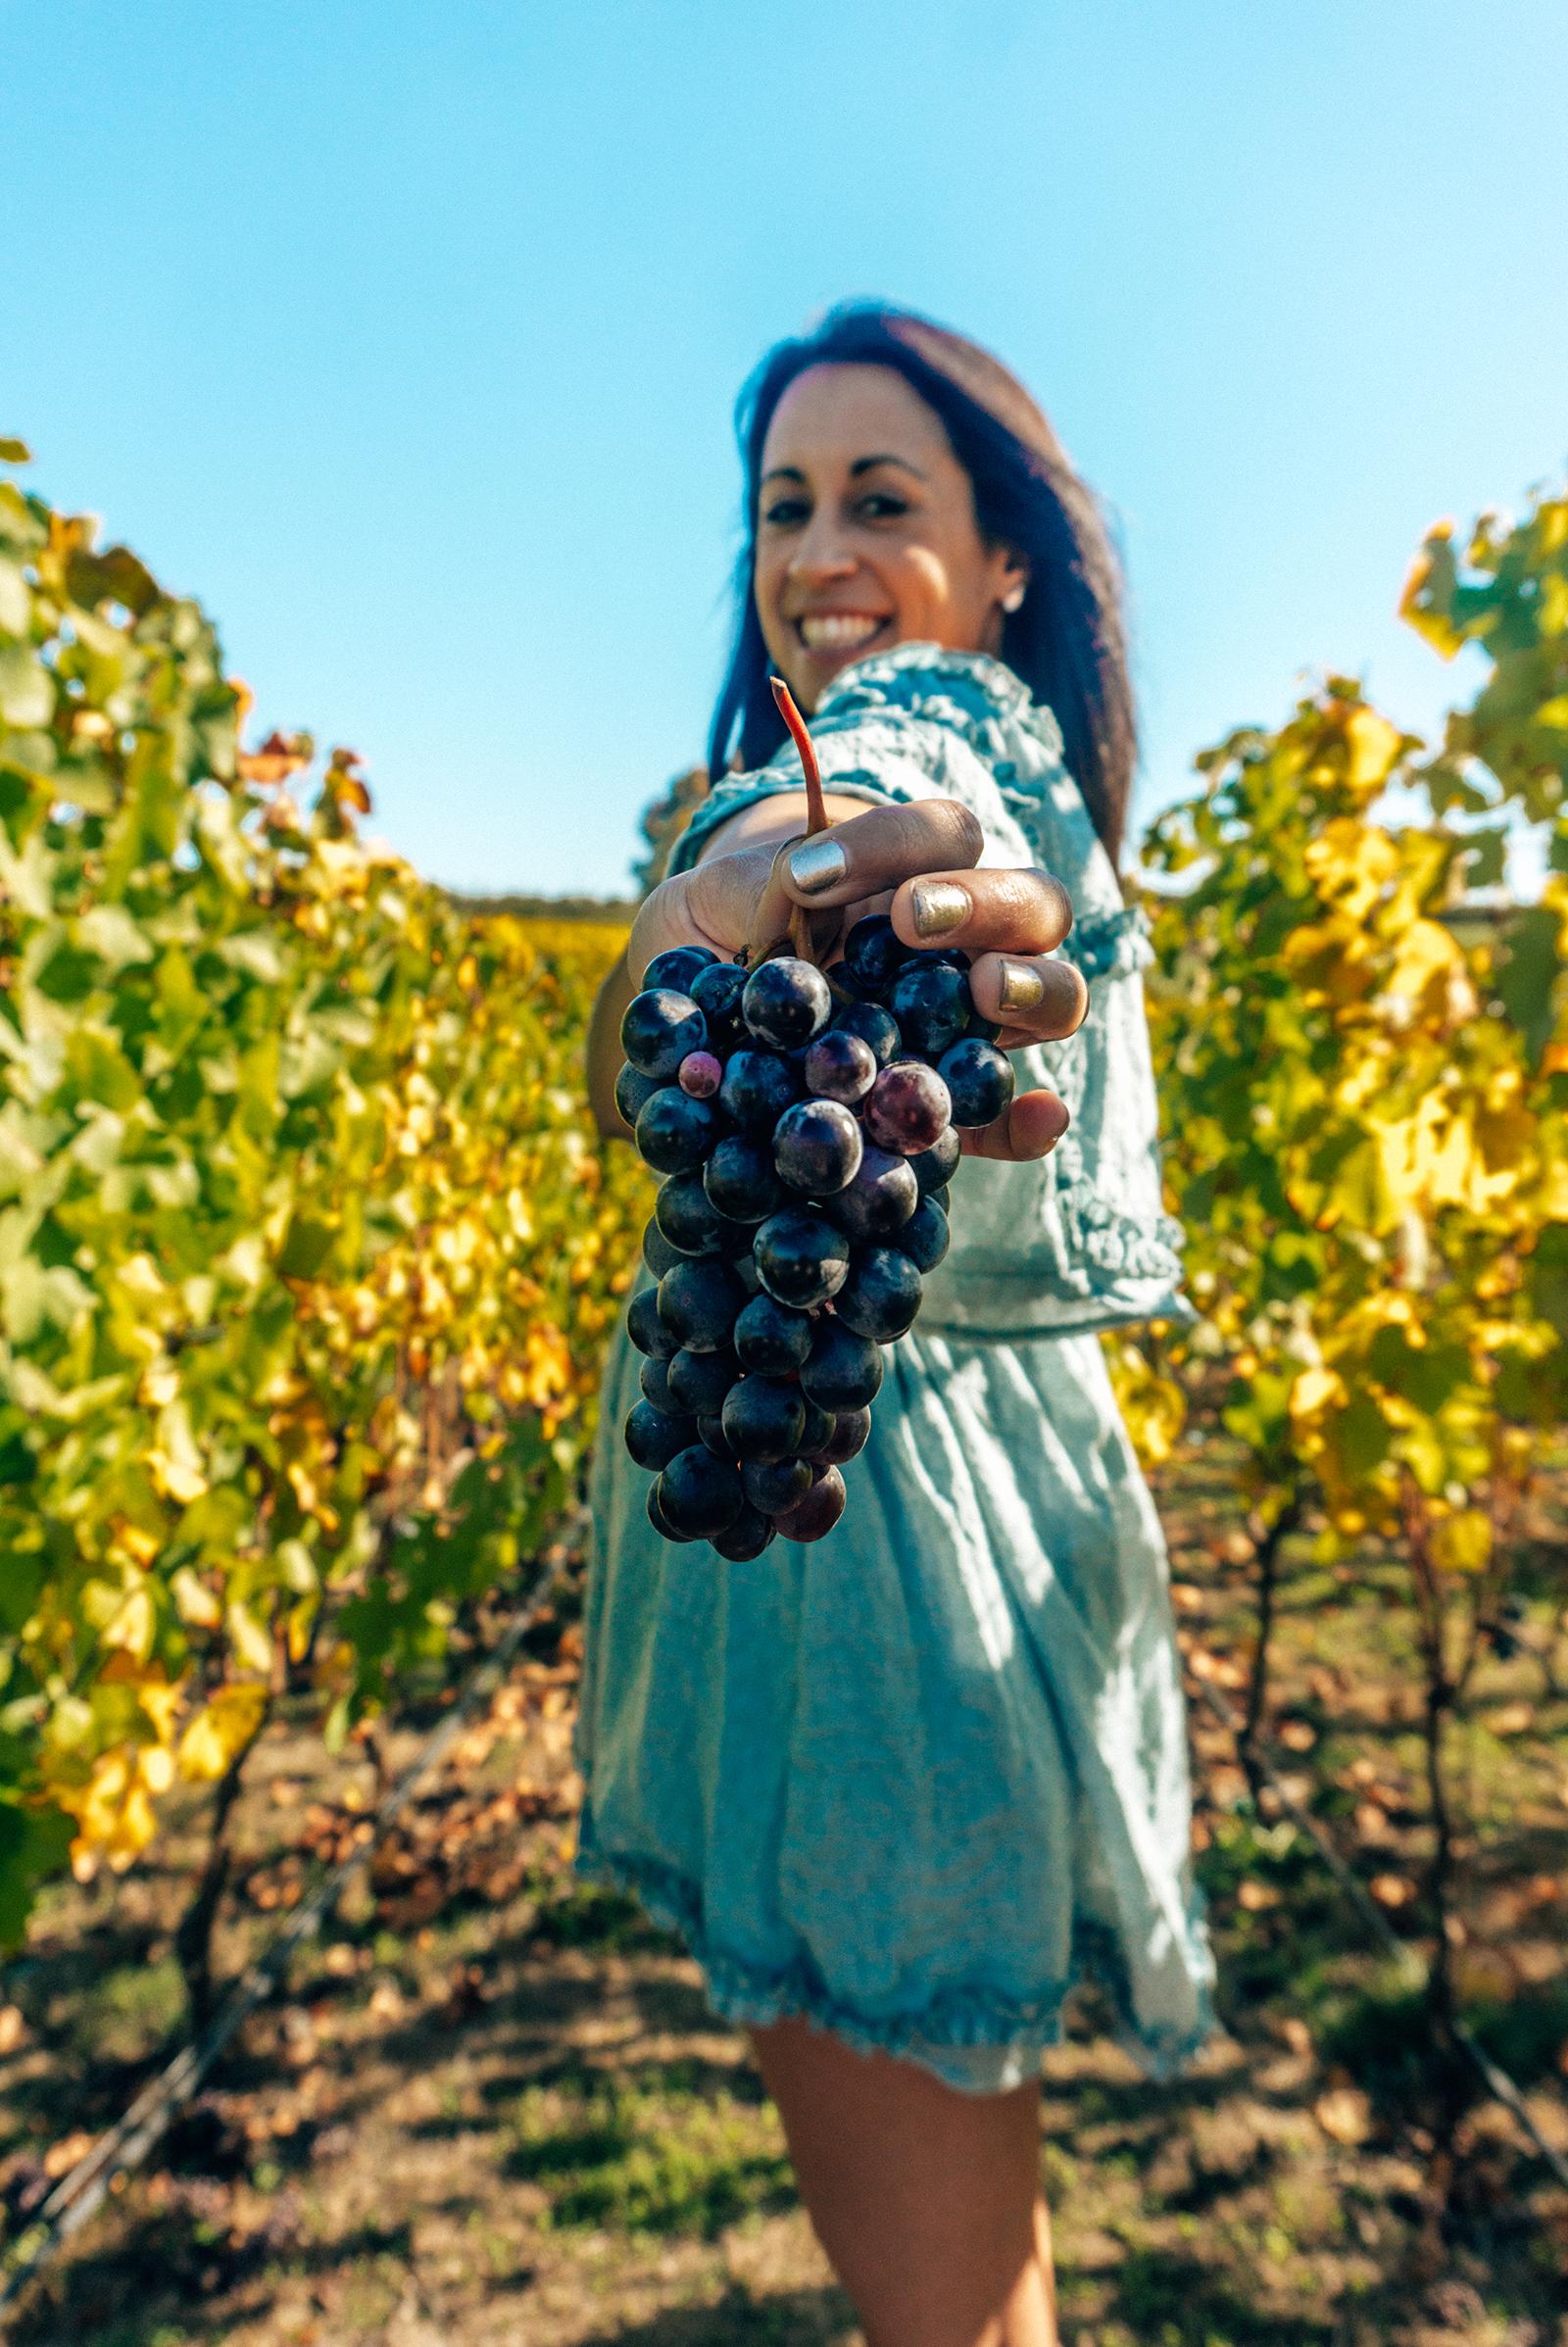 Adelsheim lindsey holding grapes